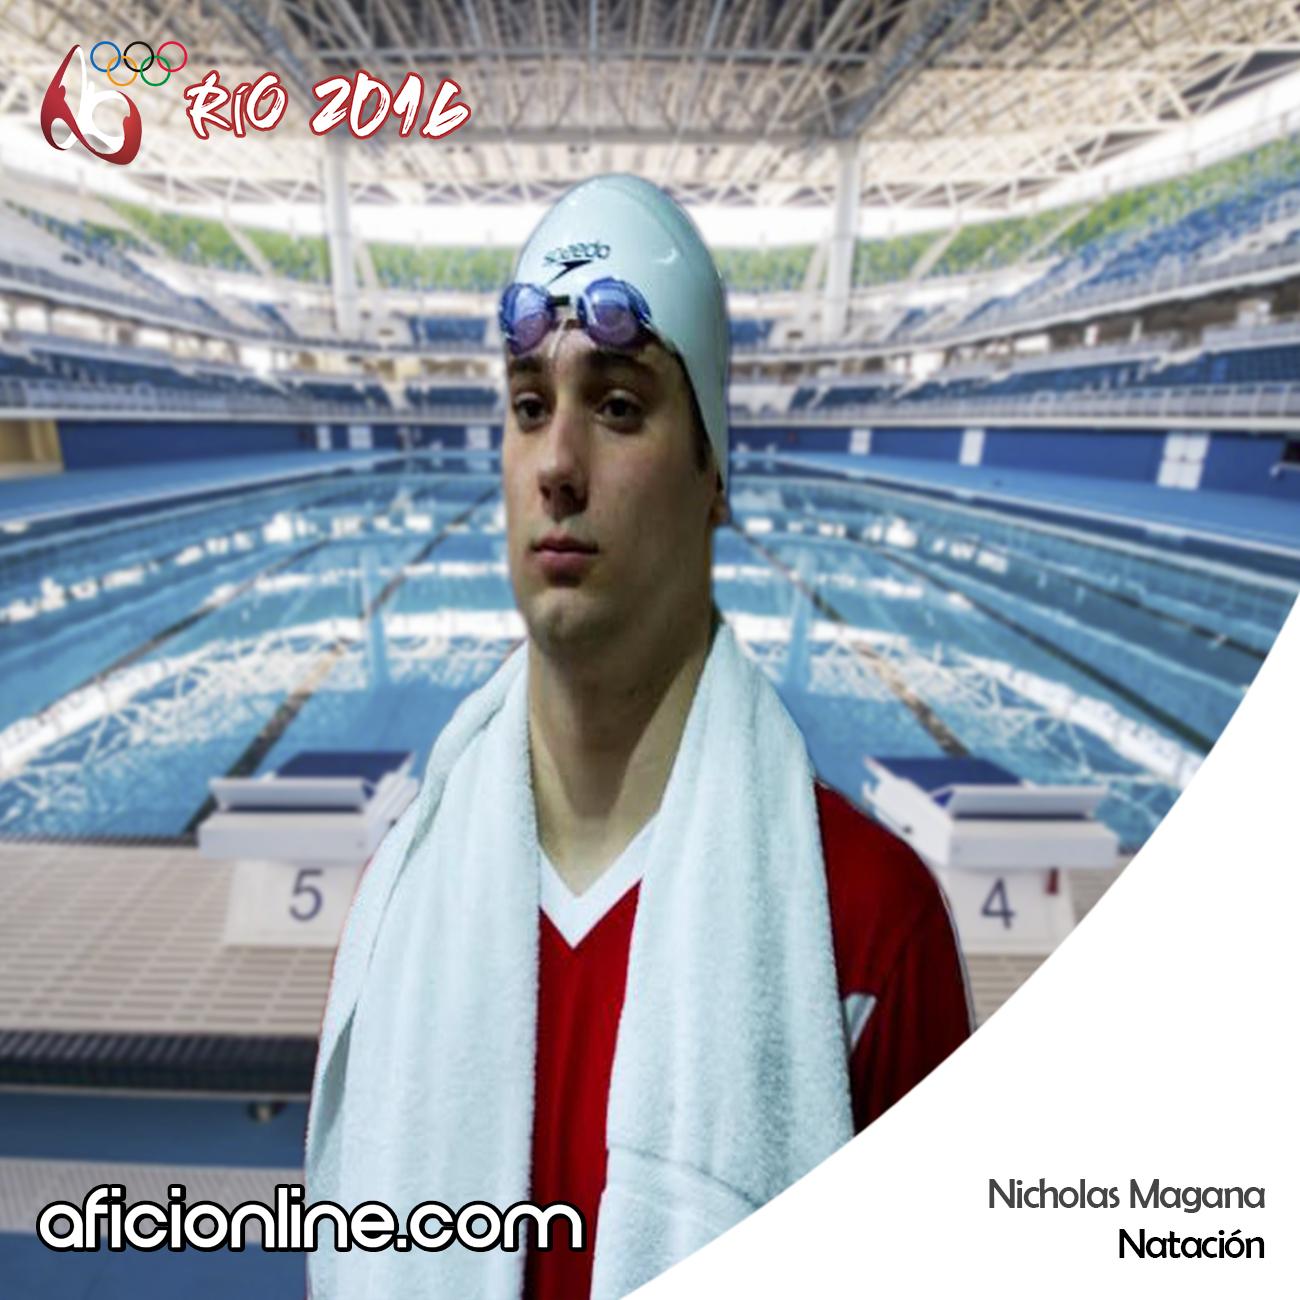 Nicholas Magana Rio 2016